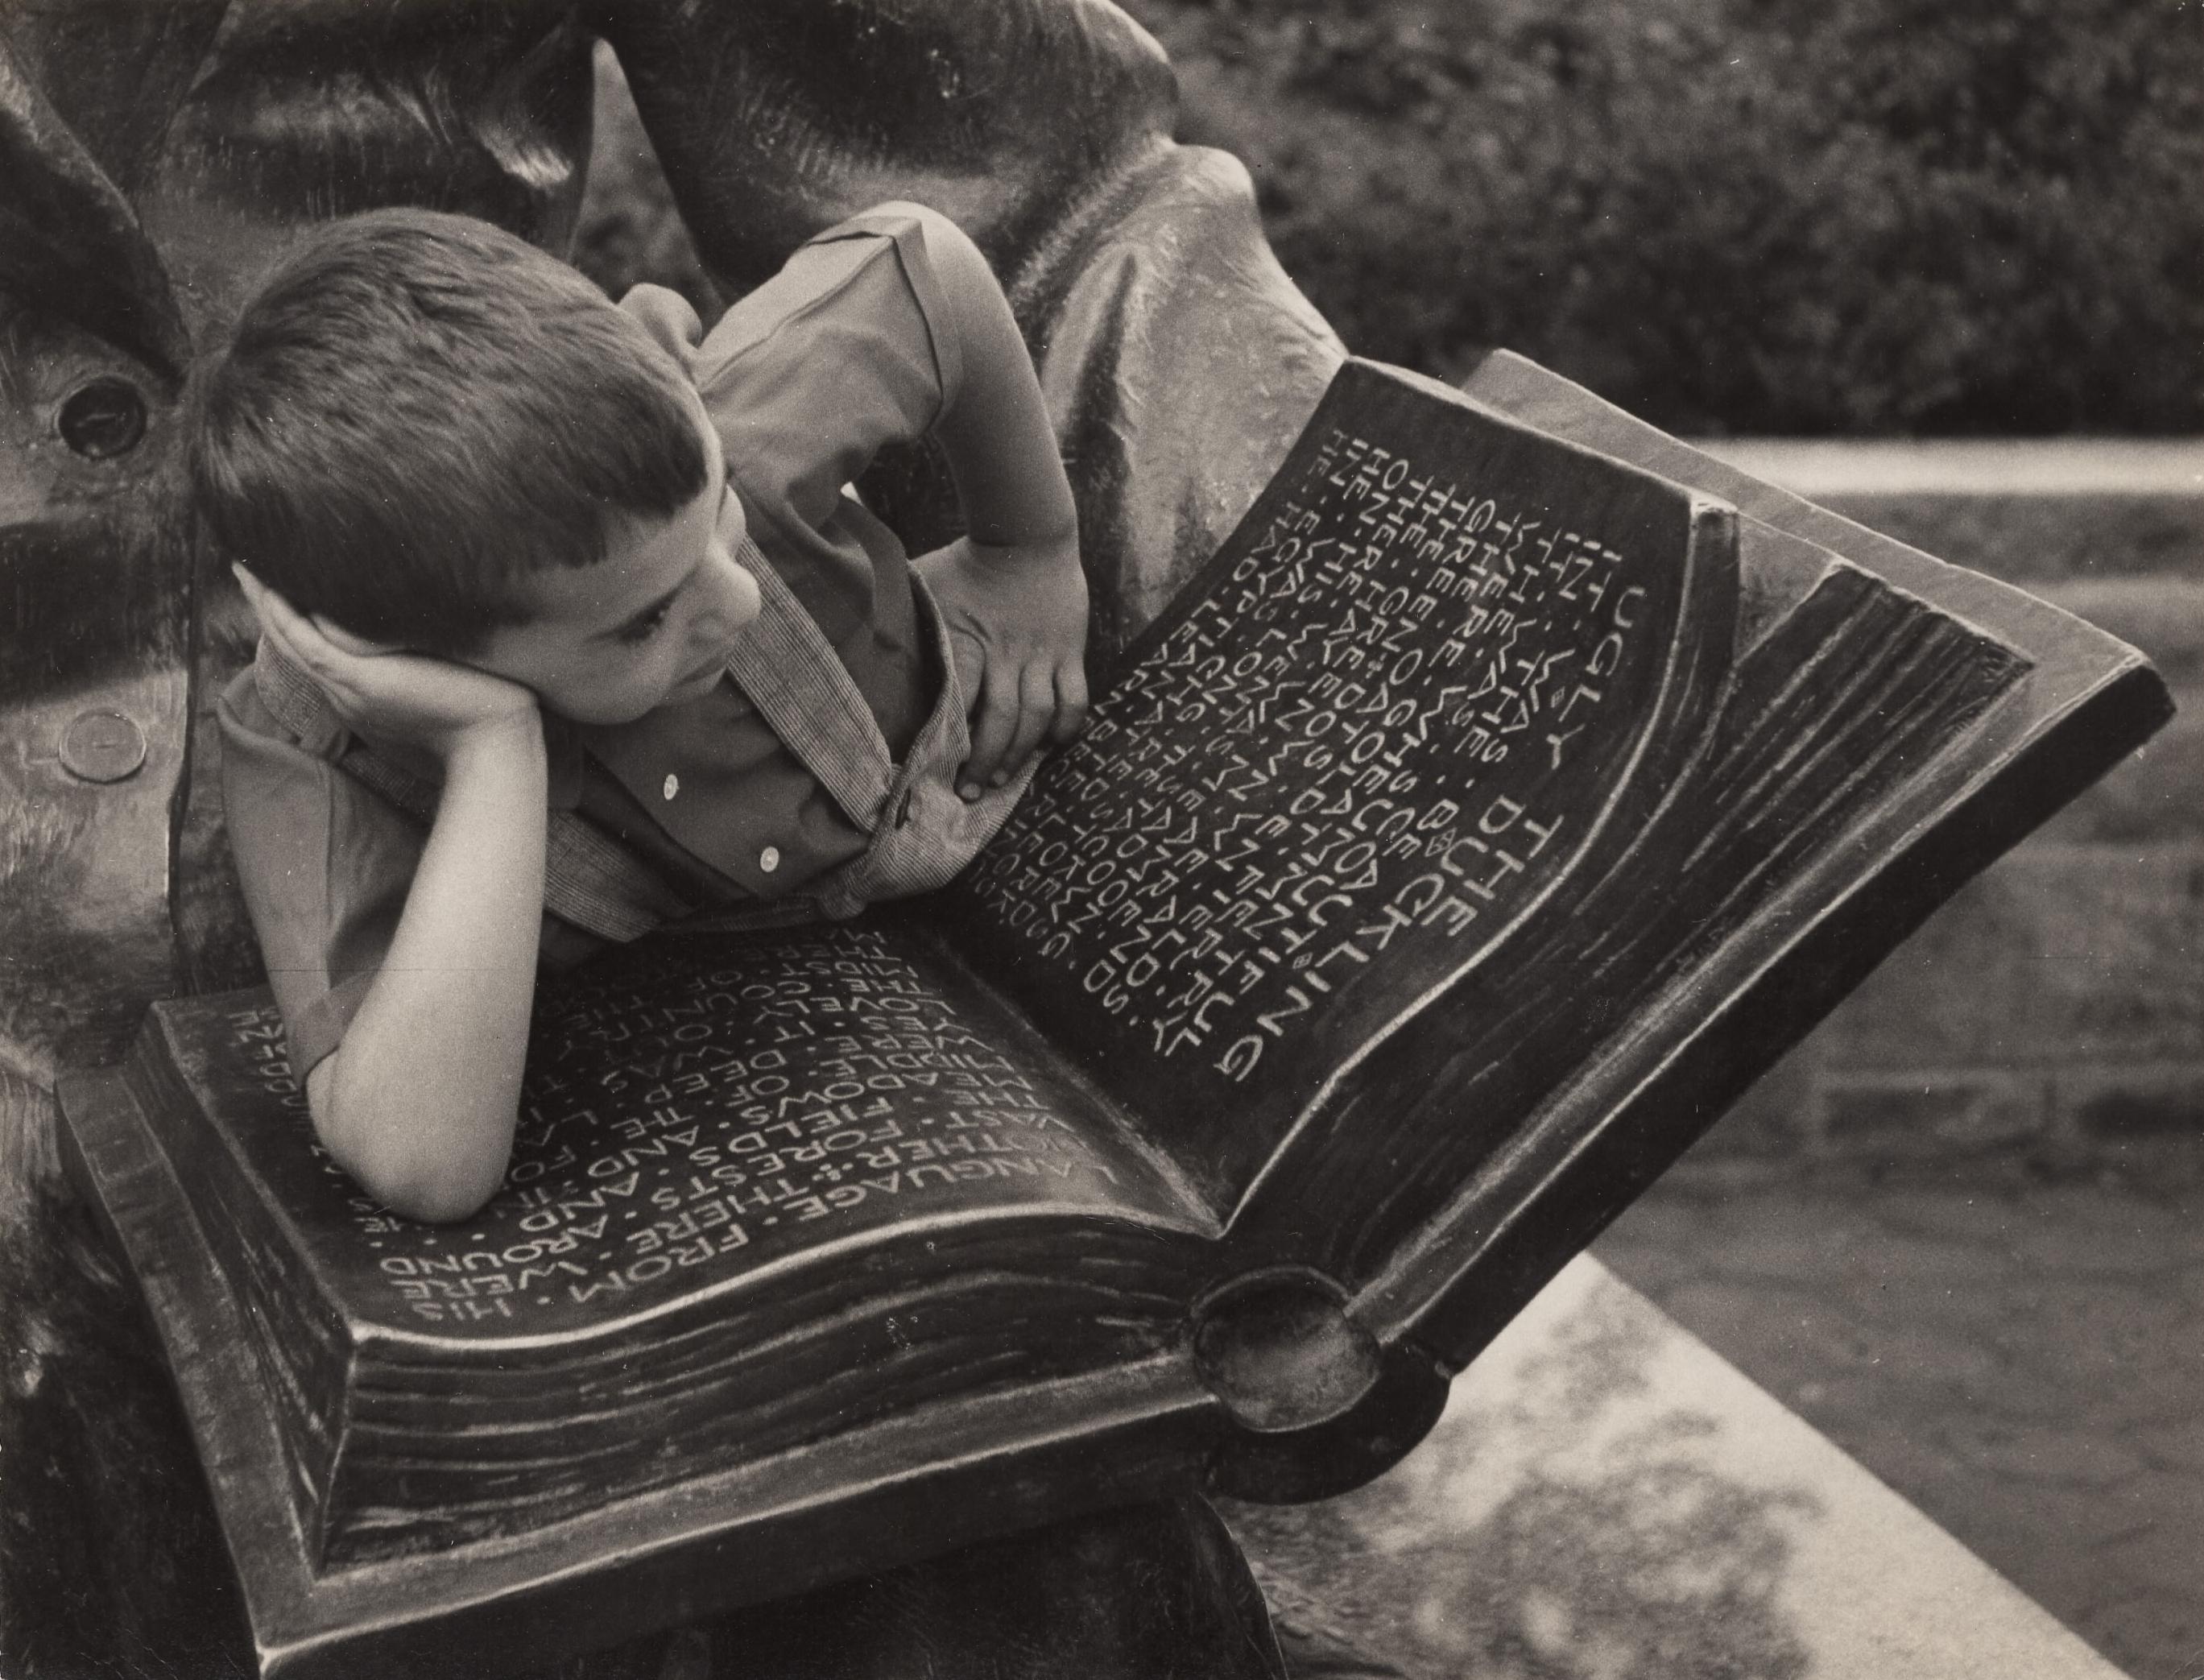 Central Park, NYC - Famous Children's Statue